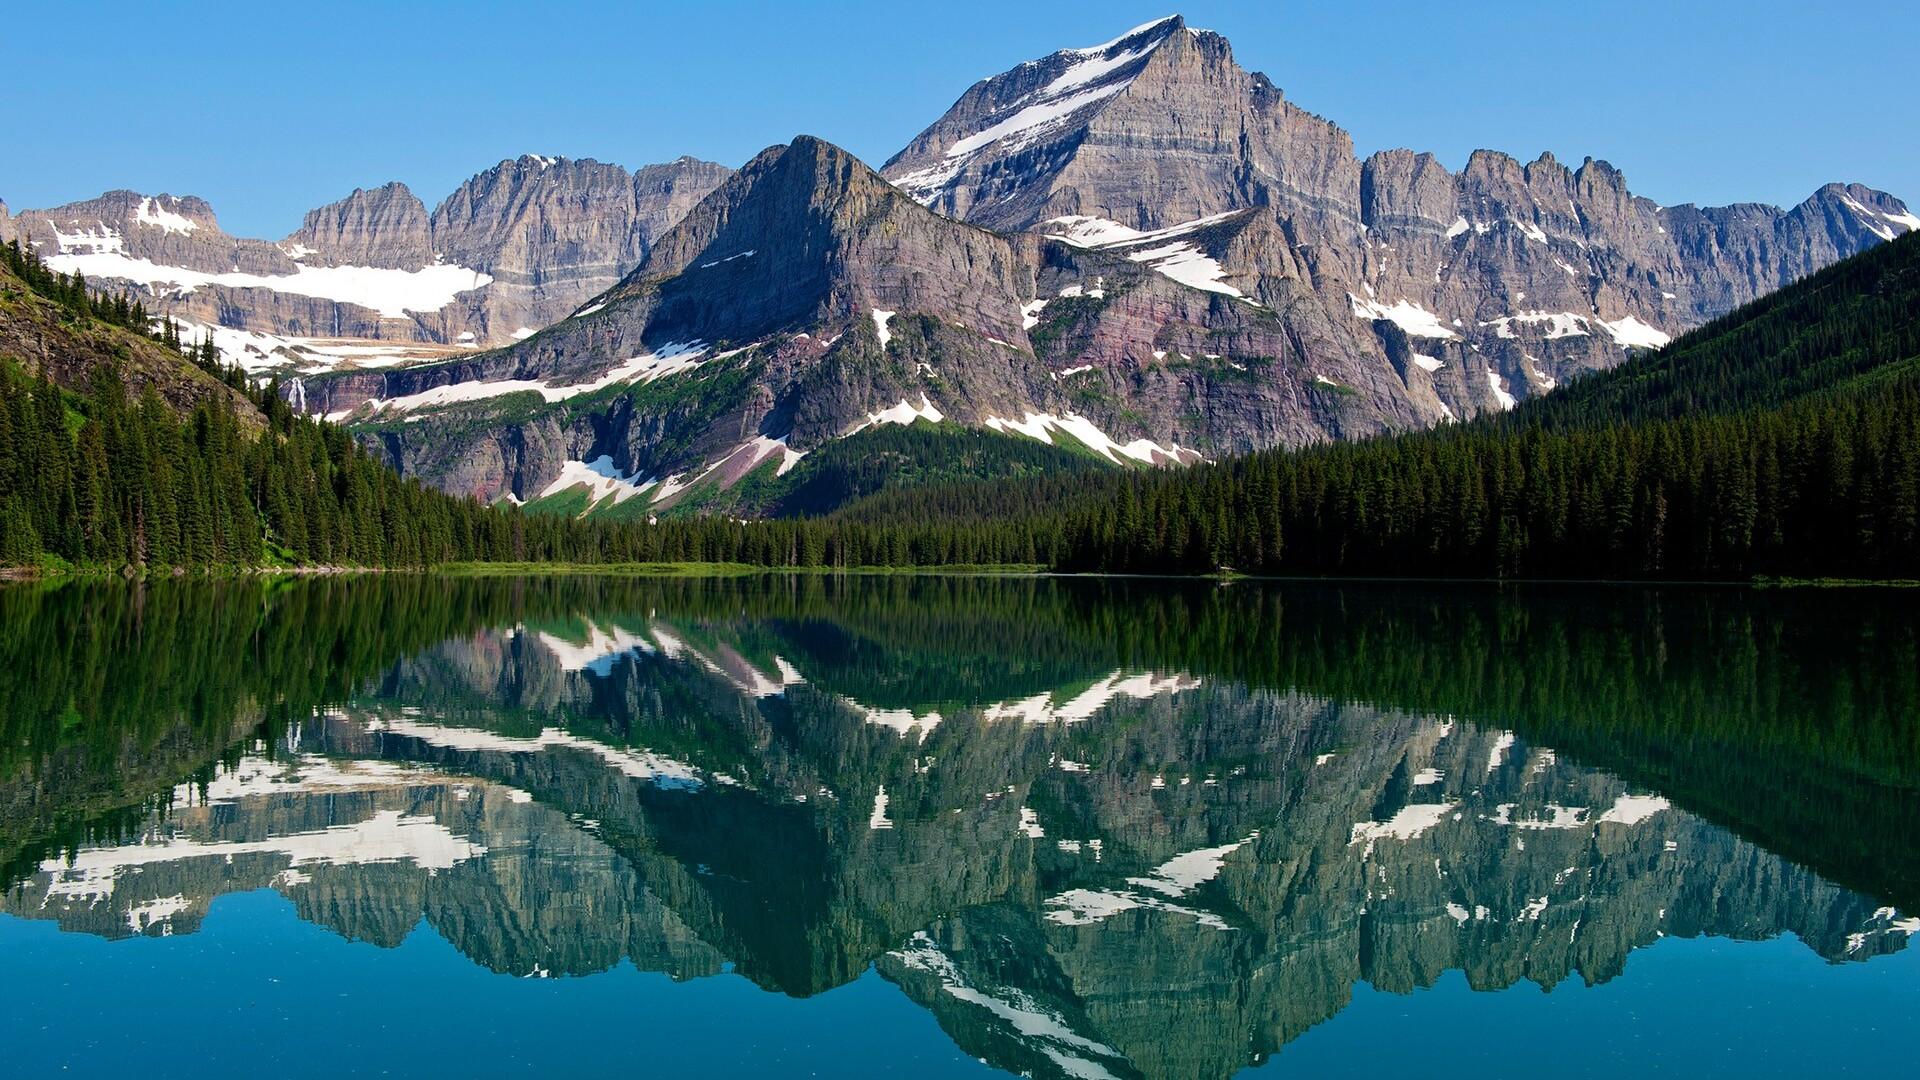 planets 1920x1080 mountain lake - photo #24